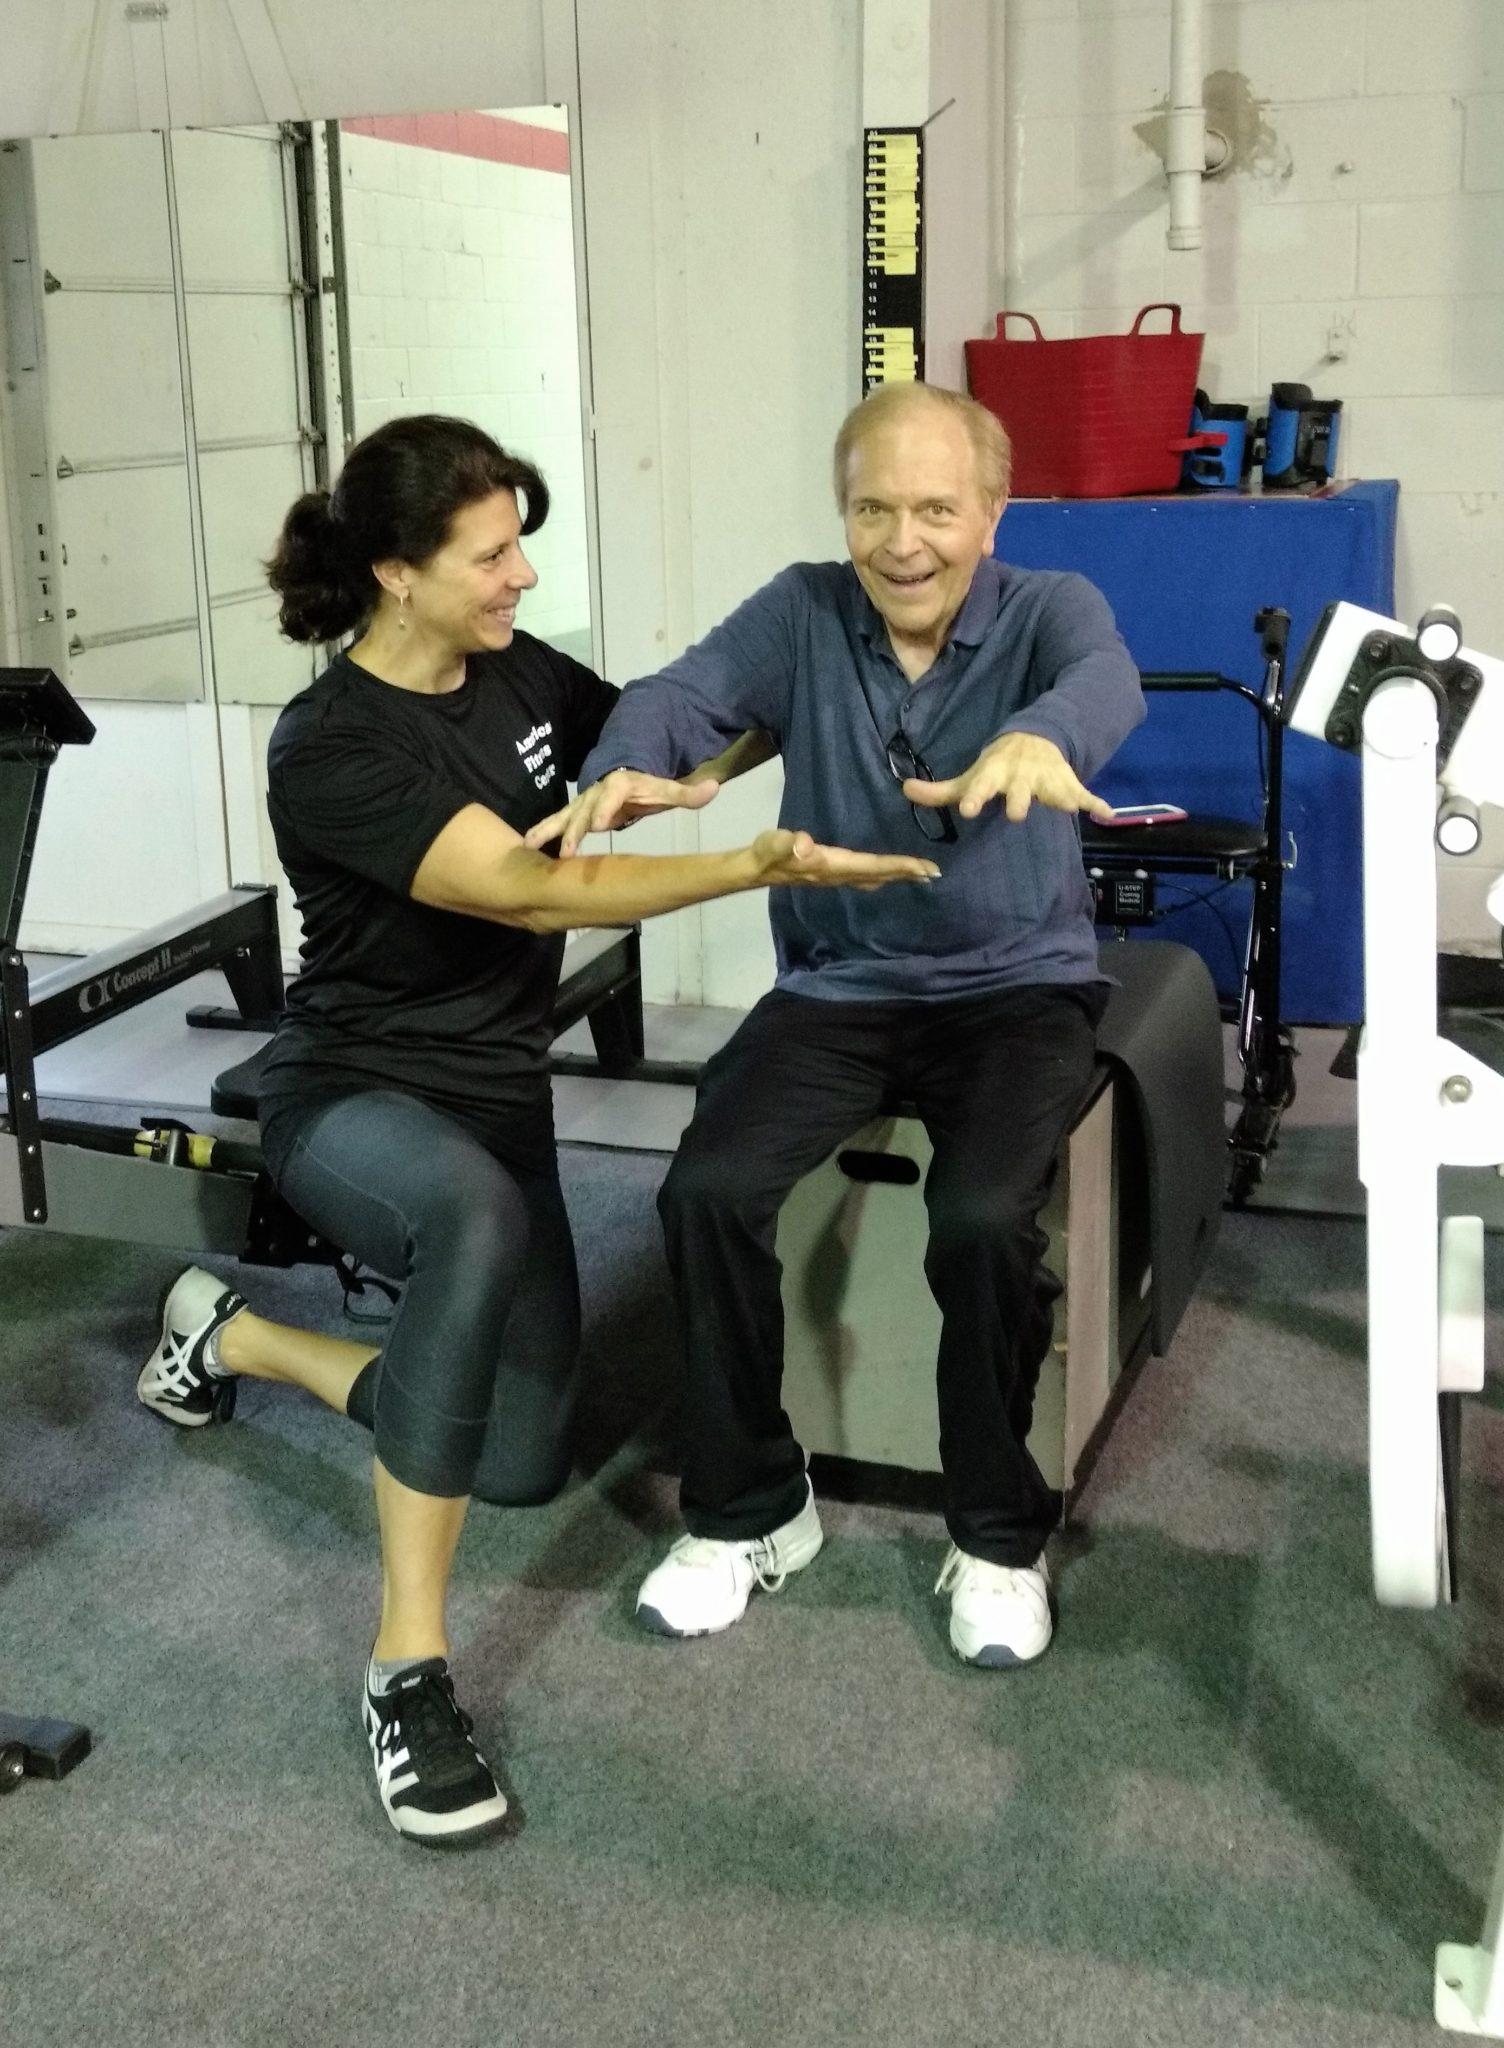 Best Fitness Nashua Hours : fitness, nashua, hours, Fitness, Nashua, Hours